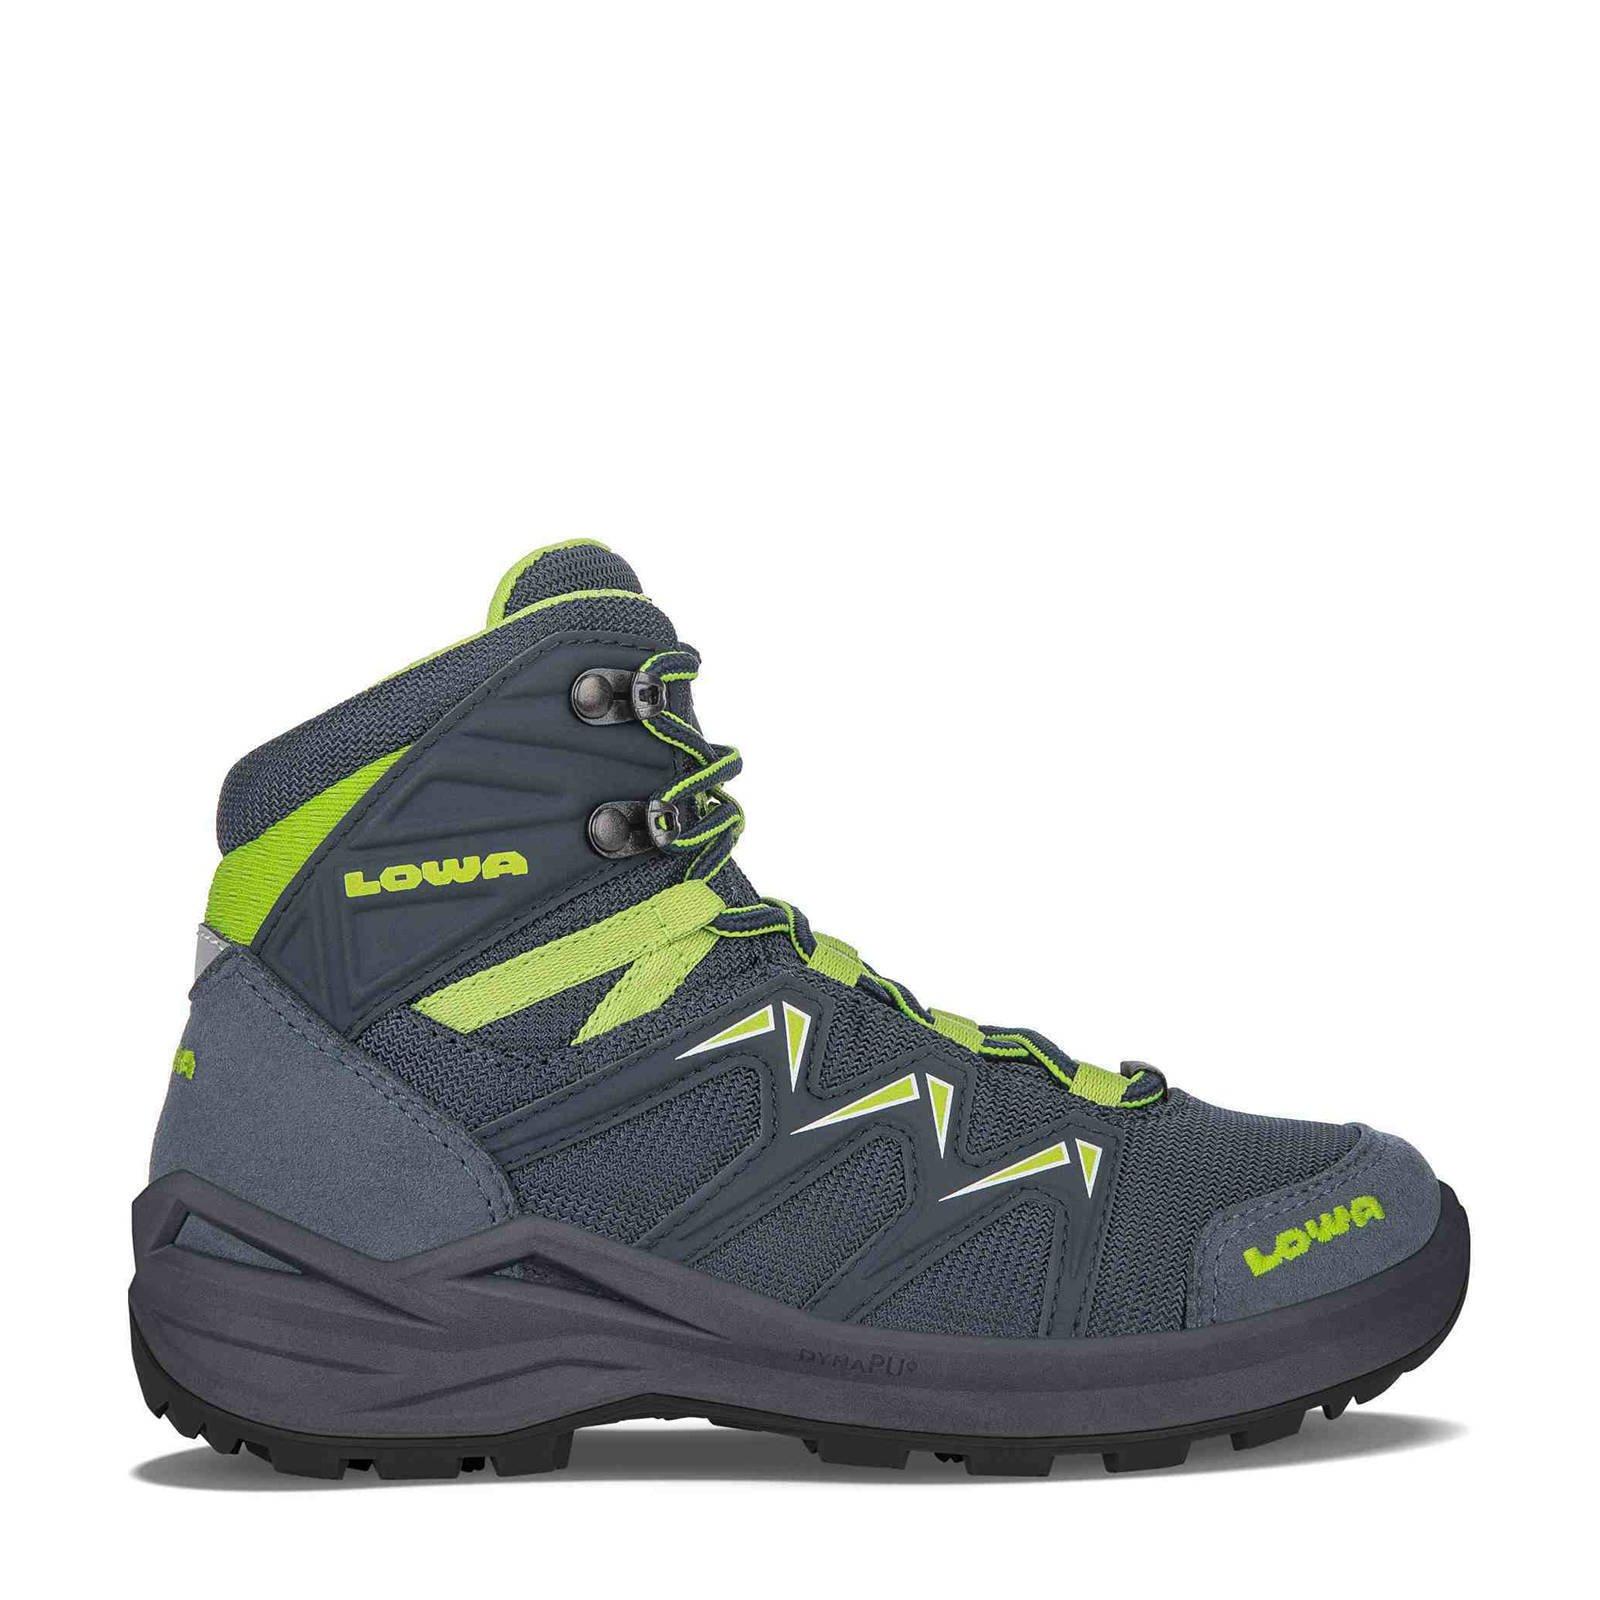 Lowa Innox Pro GTX wandelschoenen grijsblauw/lime kids online kopen